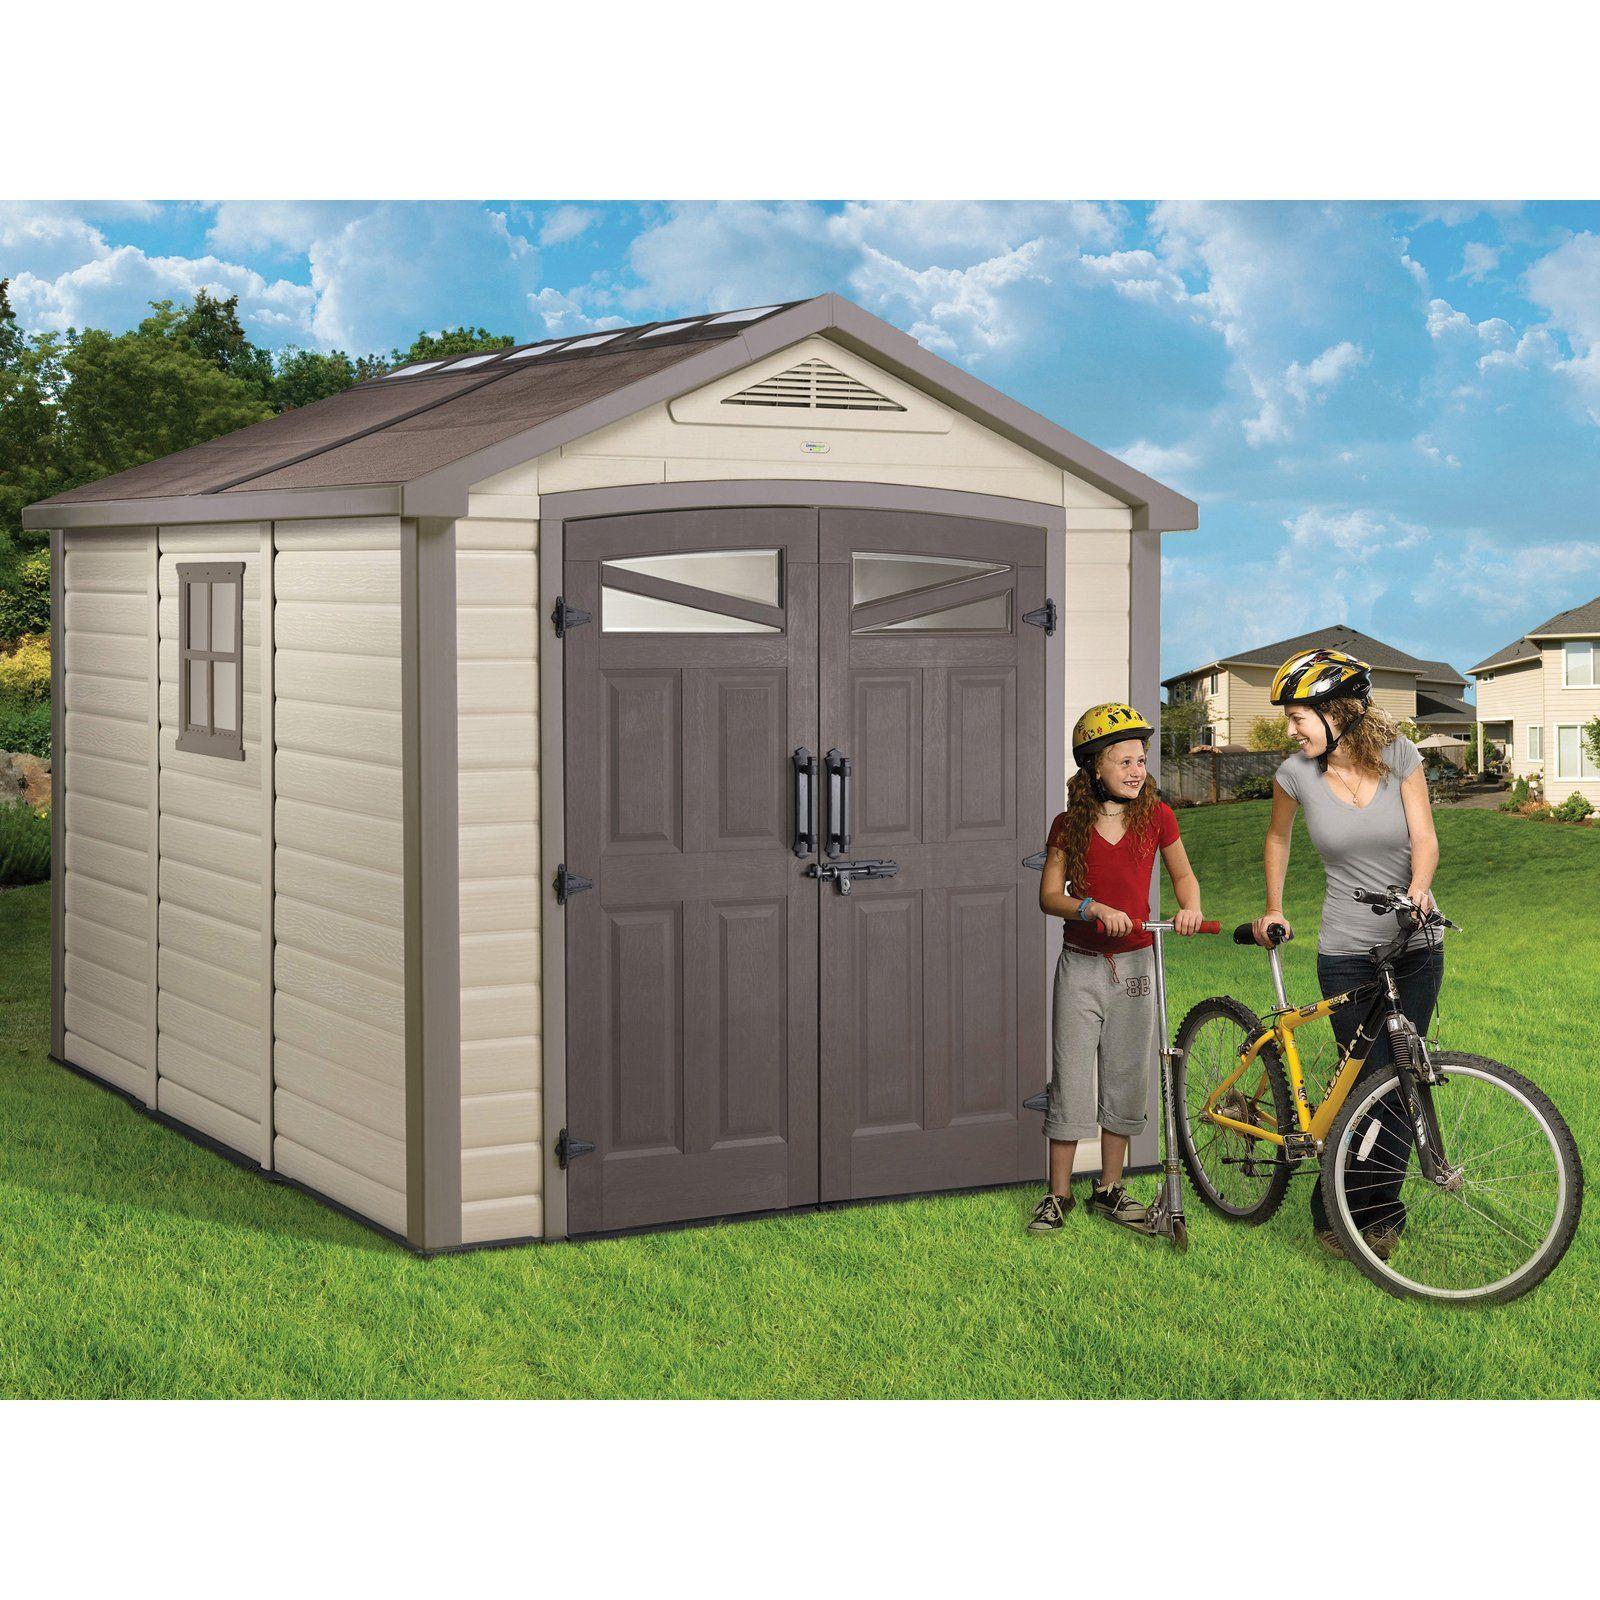 Keter Storage Shed Loft Kit $129.99